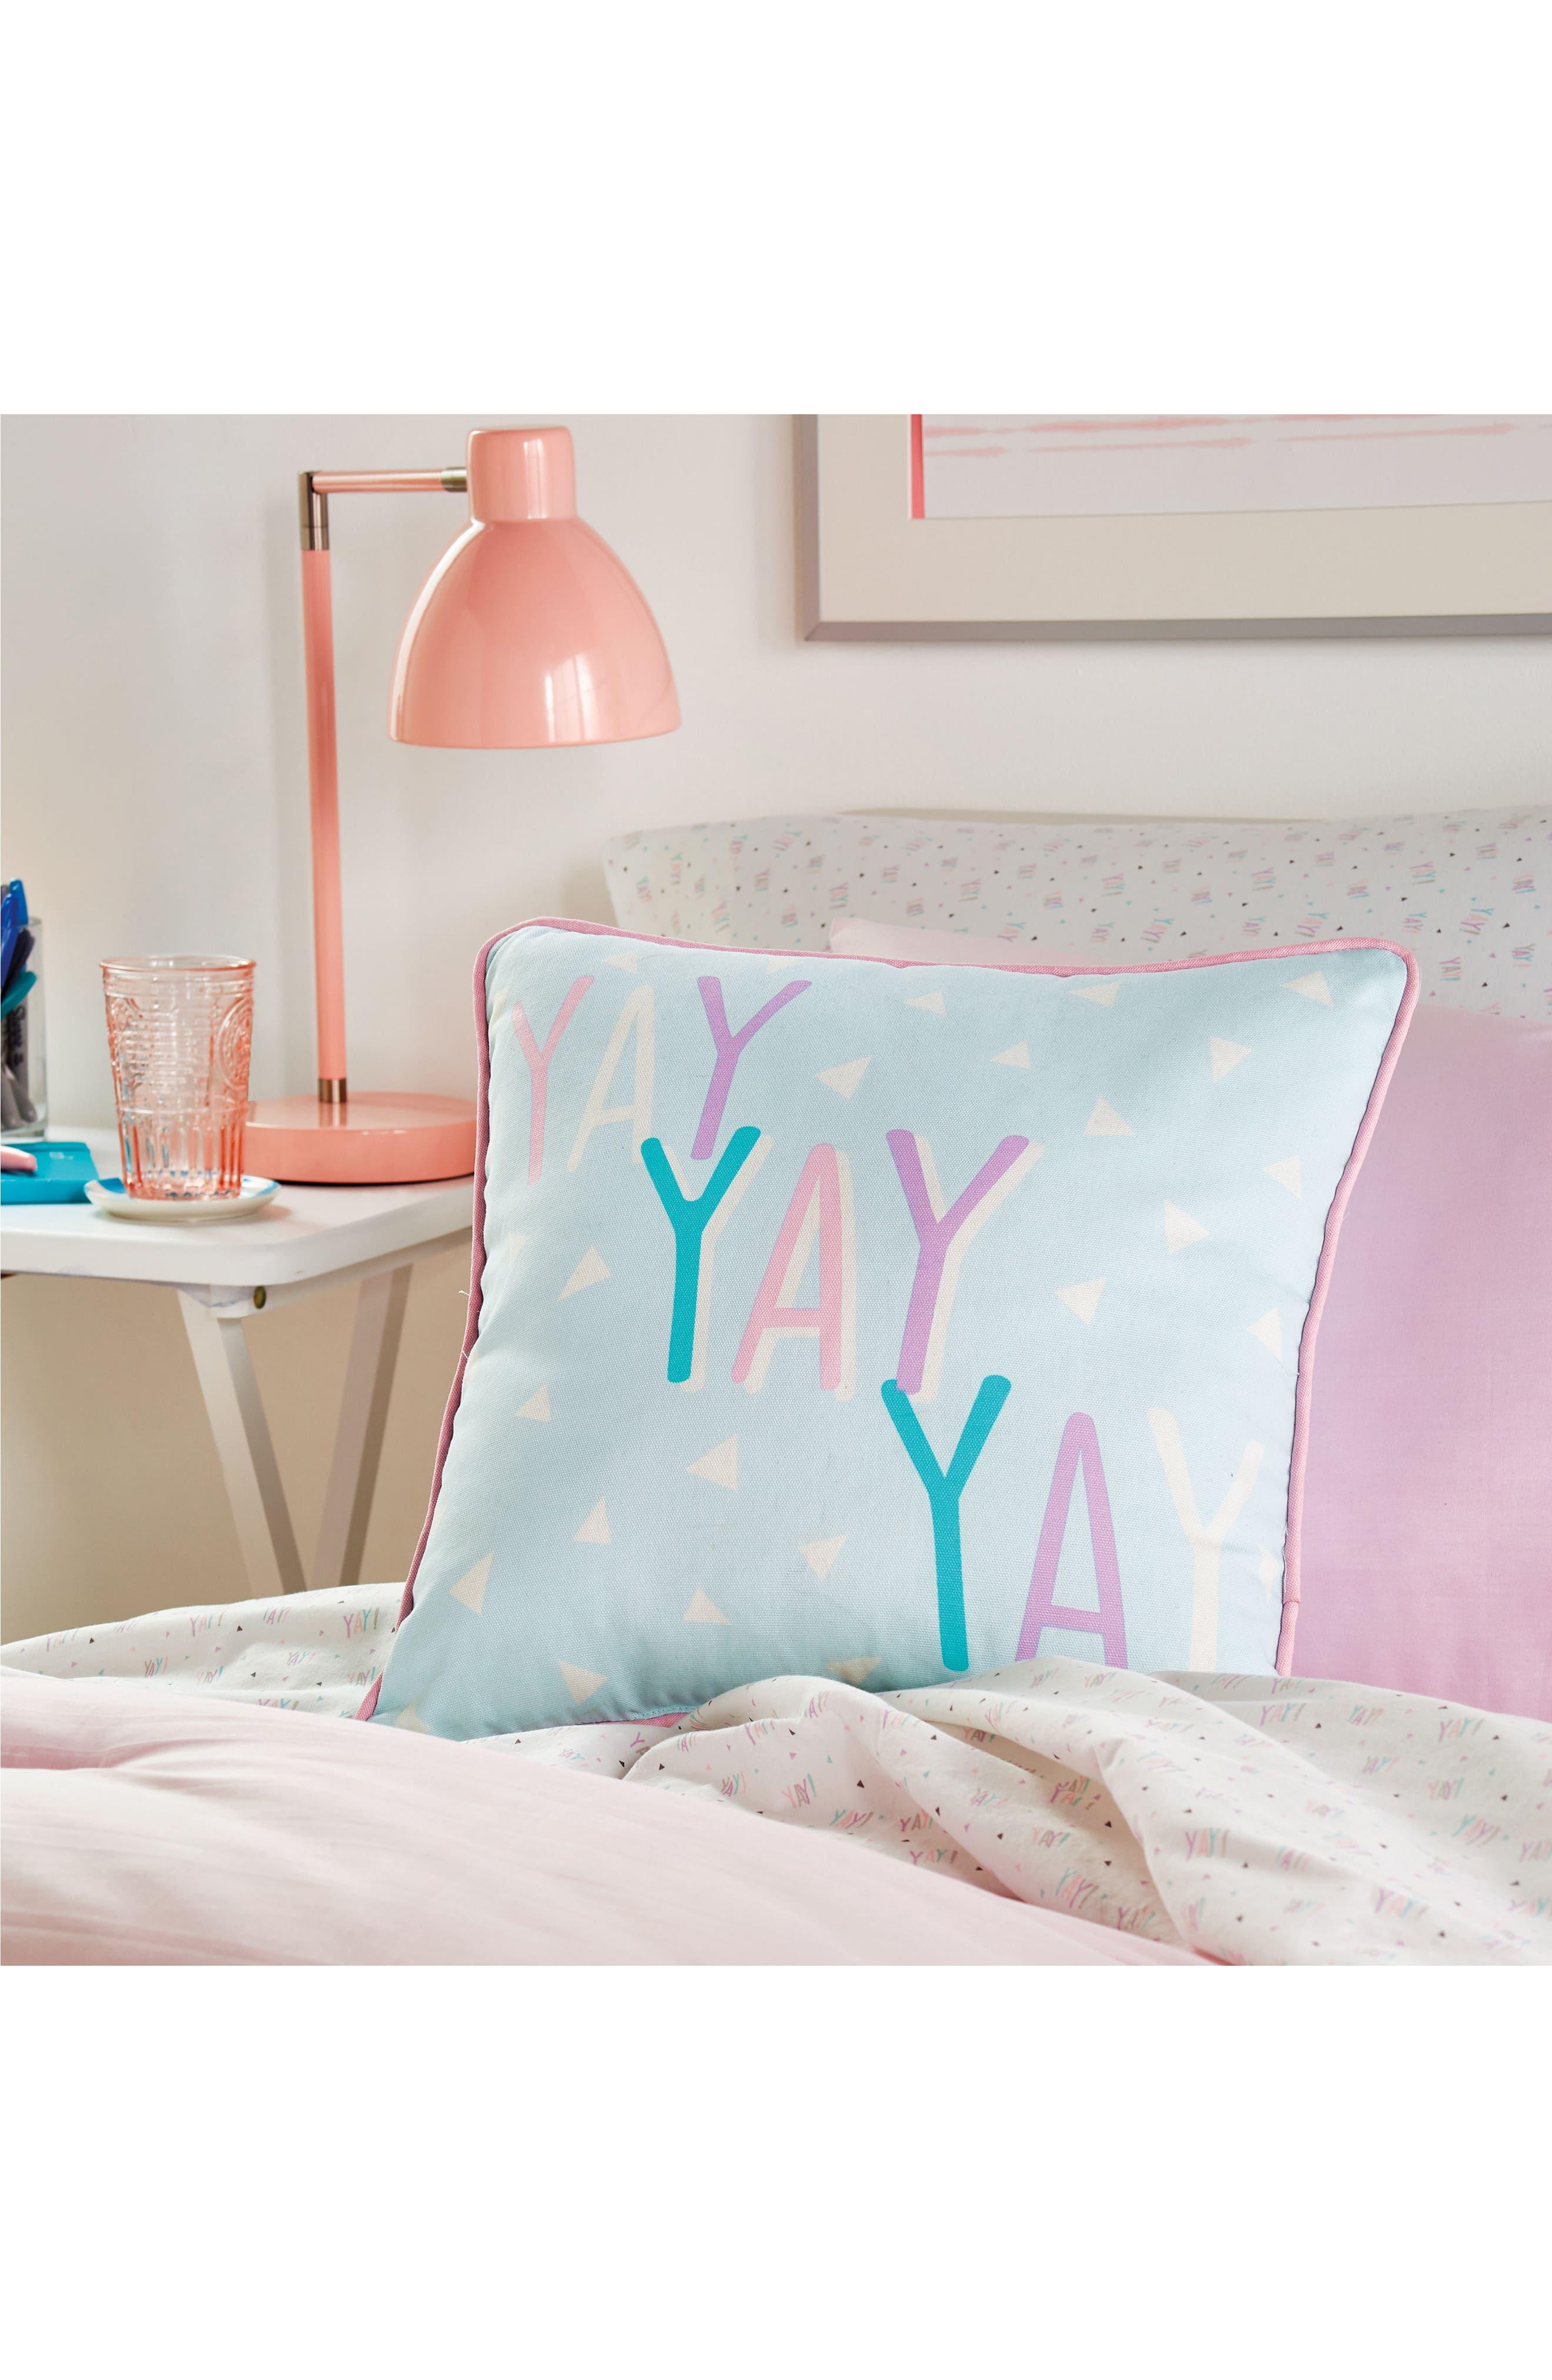 DKNY, Empire Light Comforter, Sham & Accent Pillow Set, Alternate thumbnail 4, color, 675